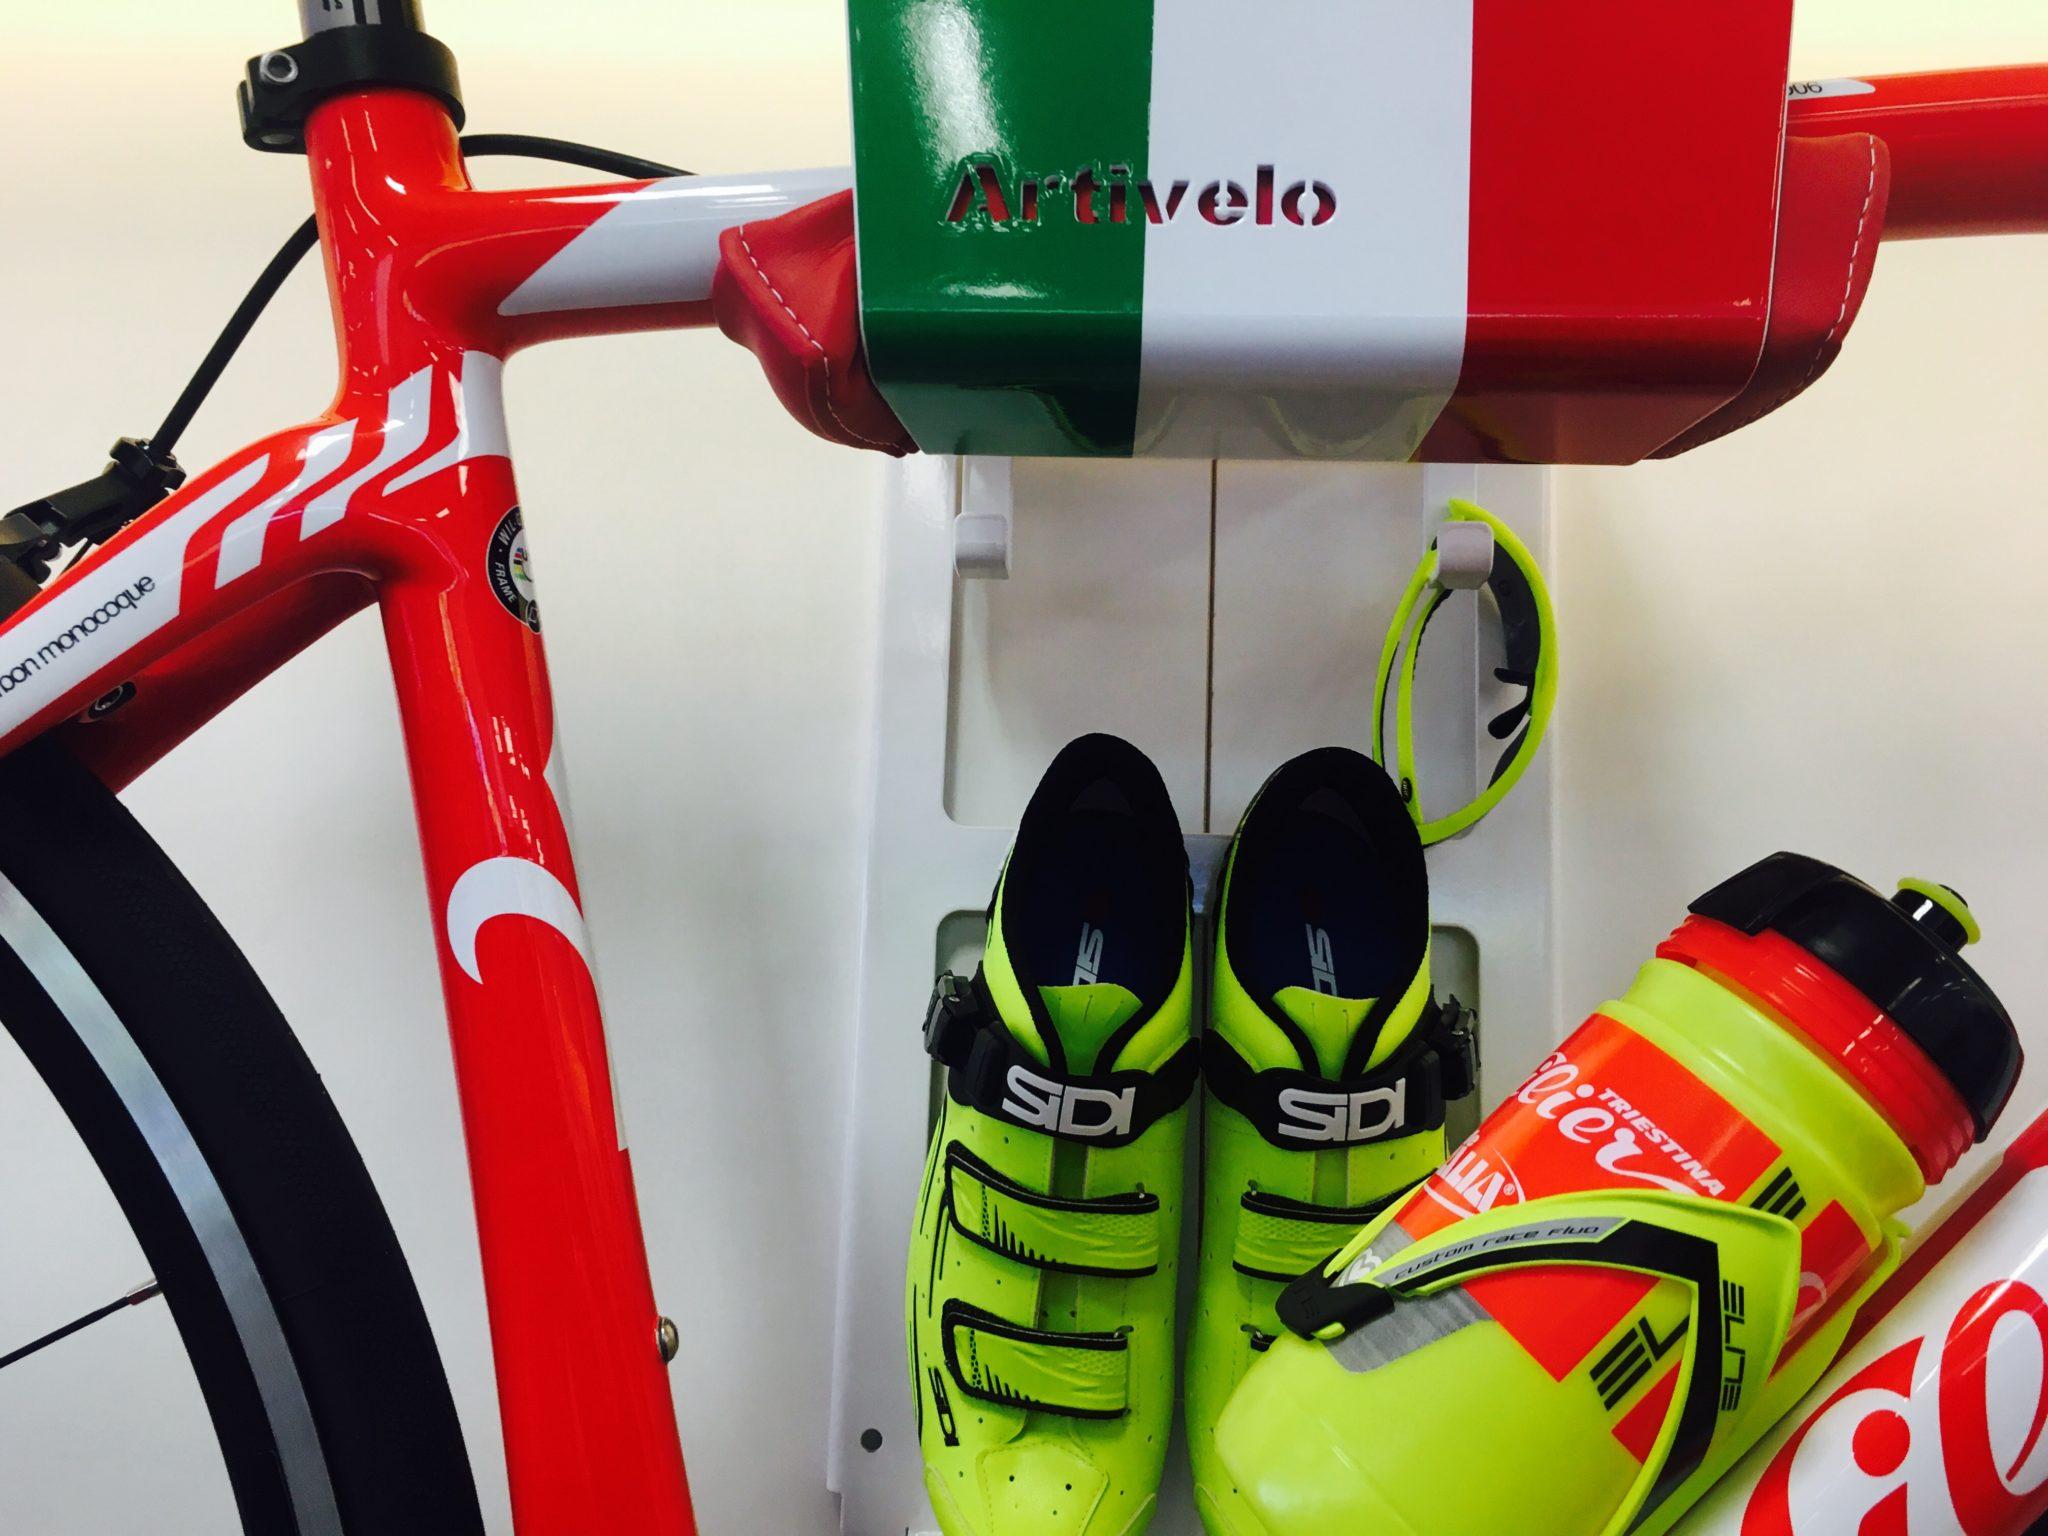 Hangingsystem racing bike italian flag